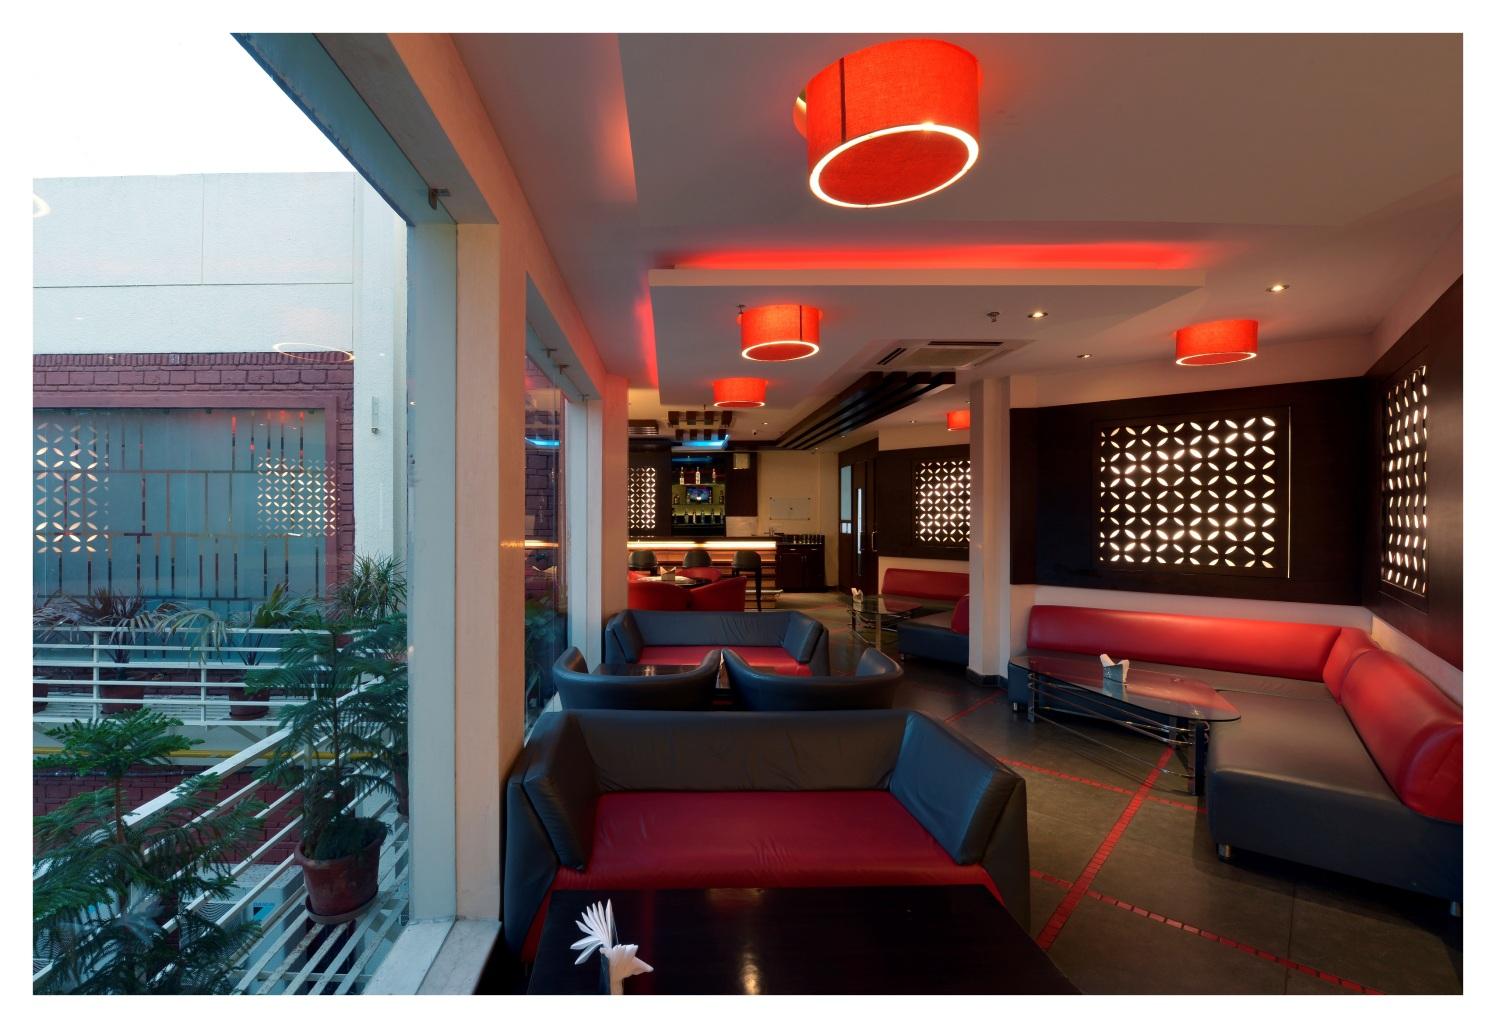 Bar With Retro Touch by Vijay Kapur Contemporary | Interior Design Photos & Ideas